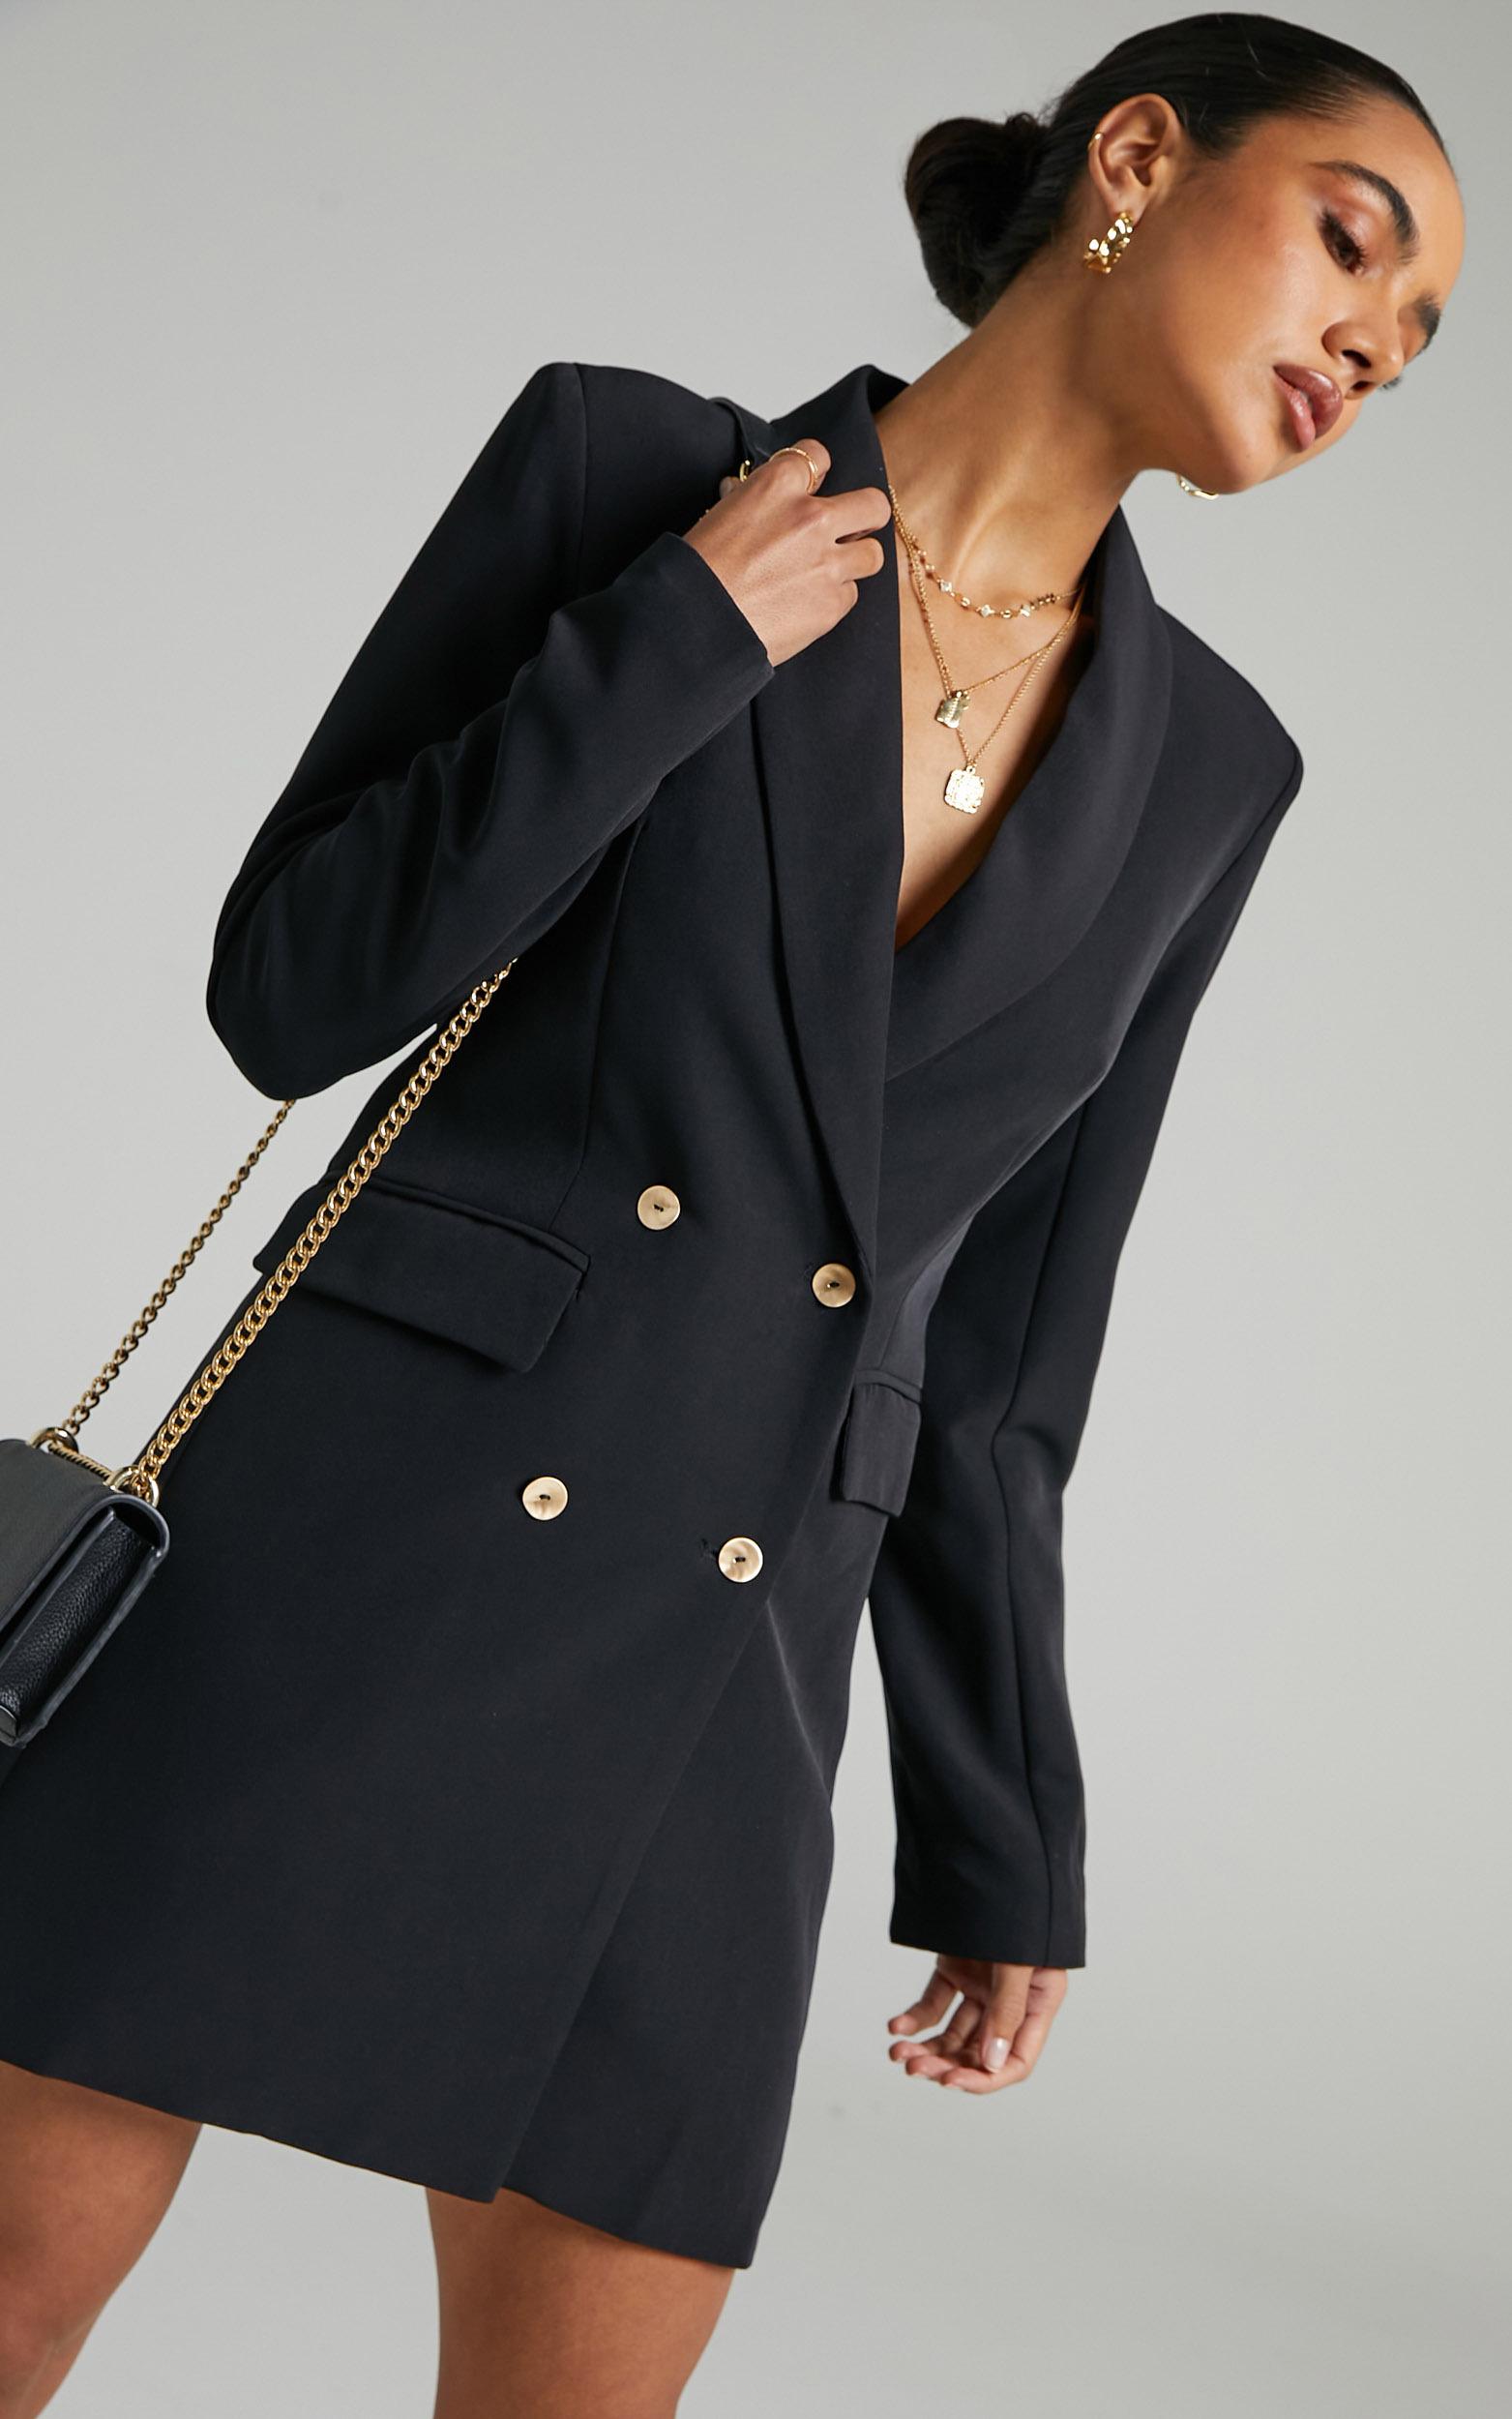 Carina Long Sleeve Blazer Dress in Black - 06, BLK1, hi-res image number null